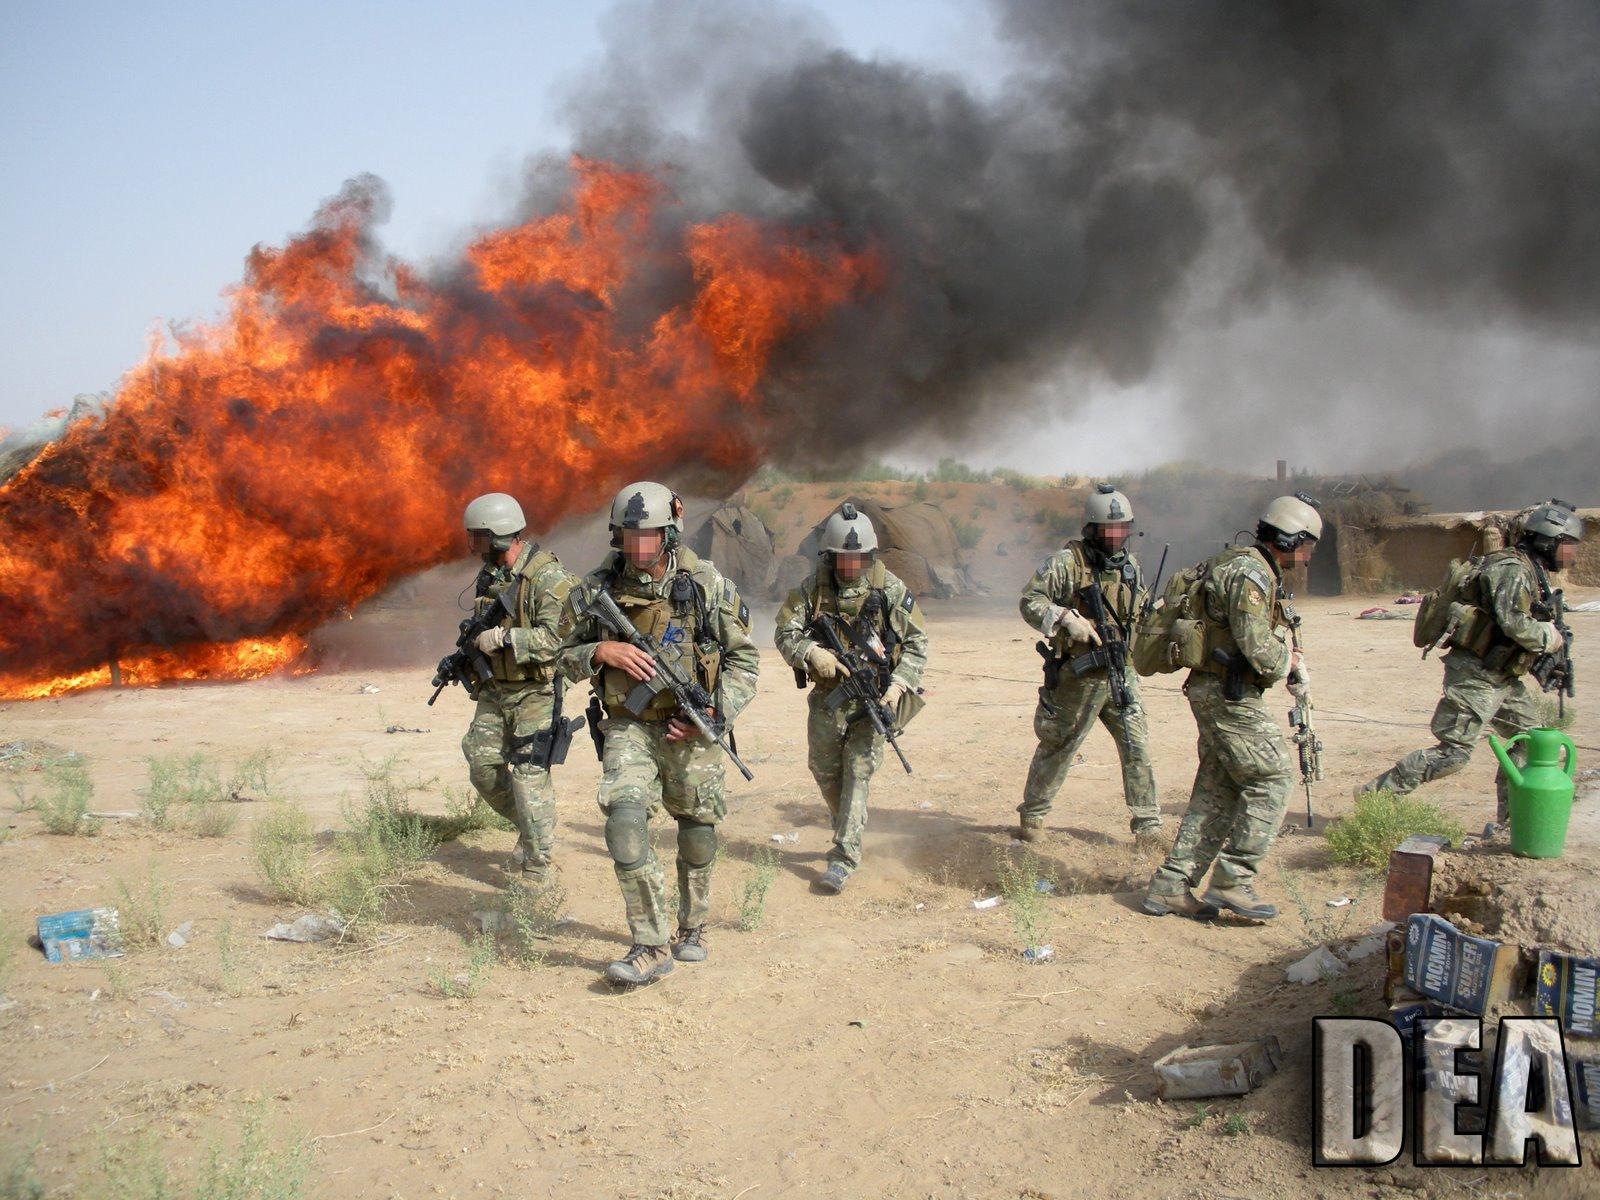 Dea Special Forces